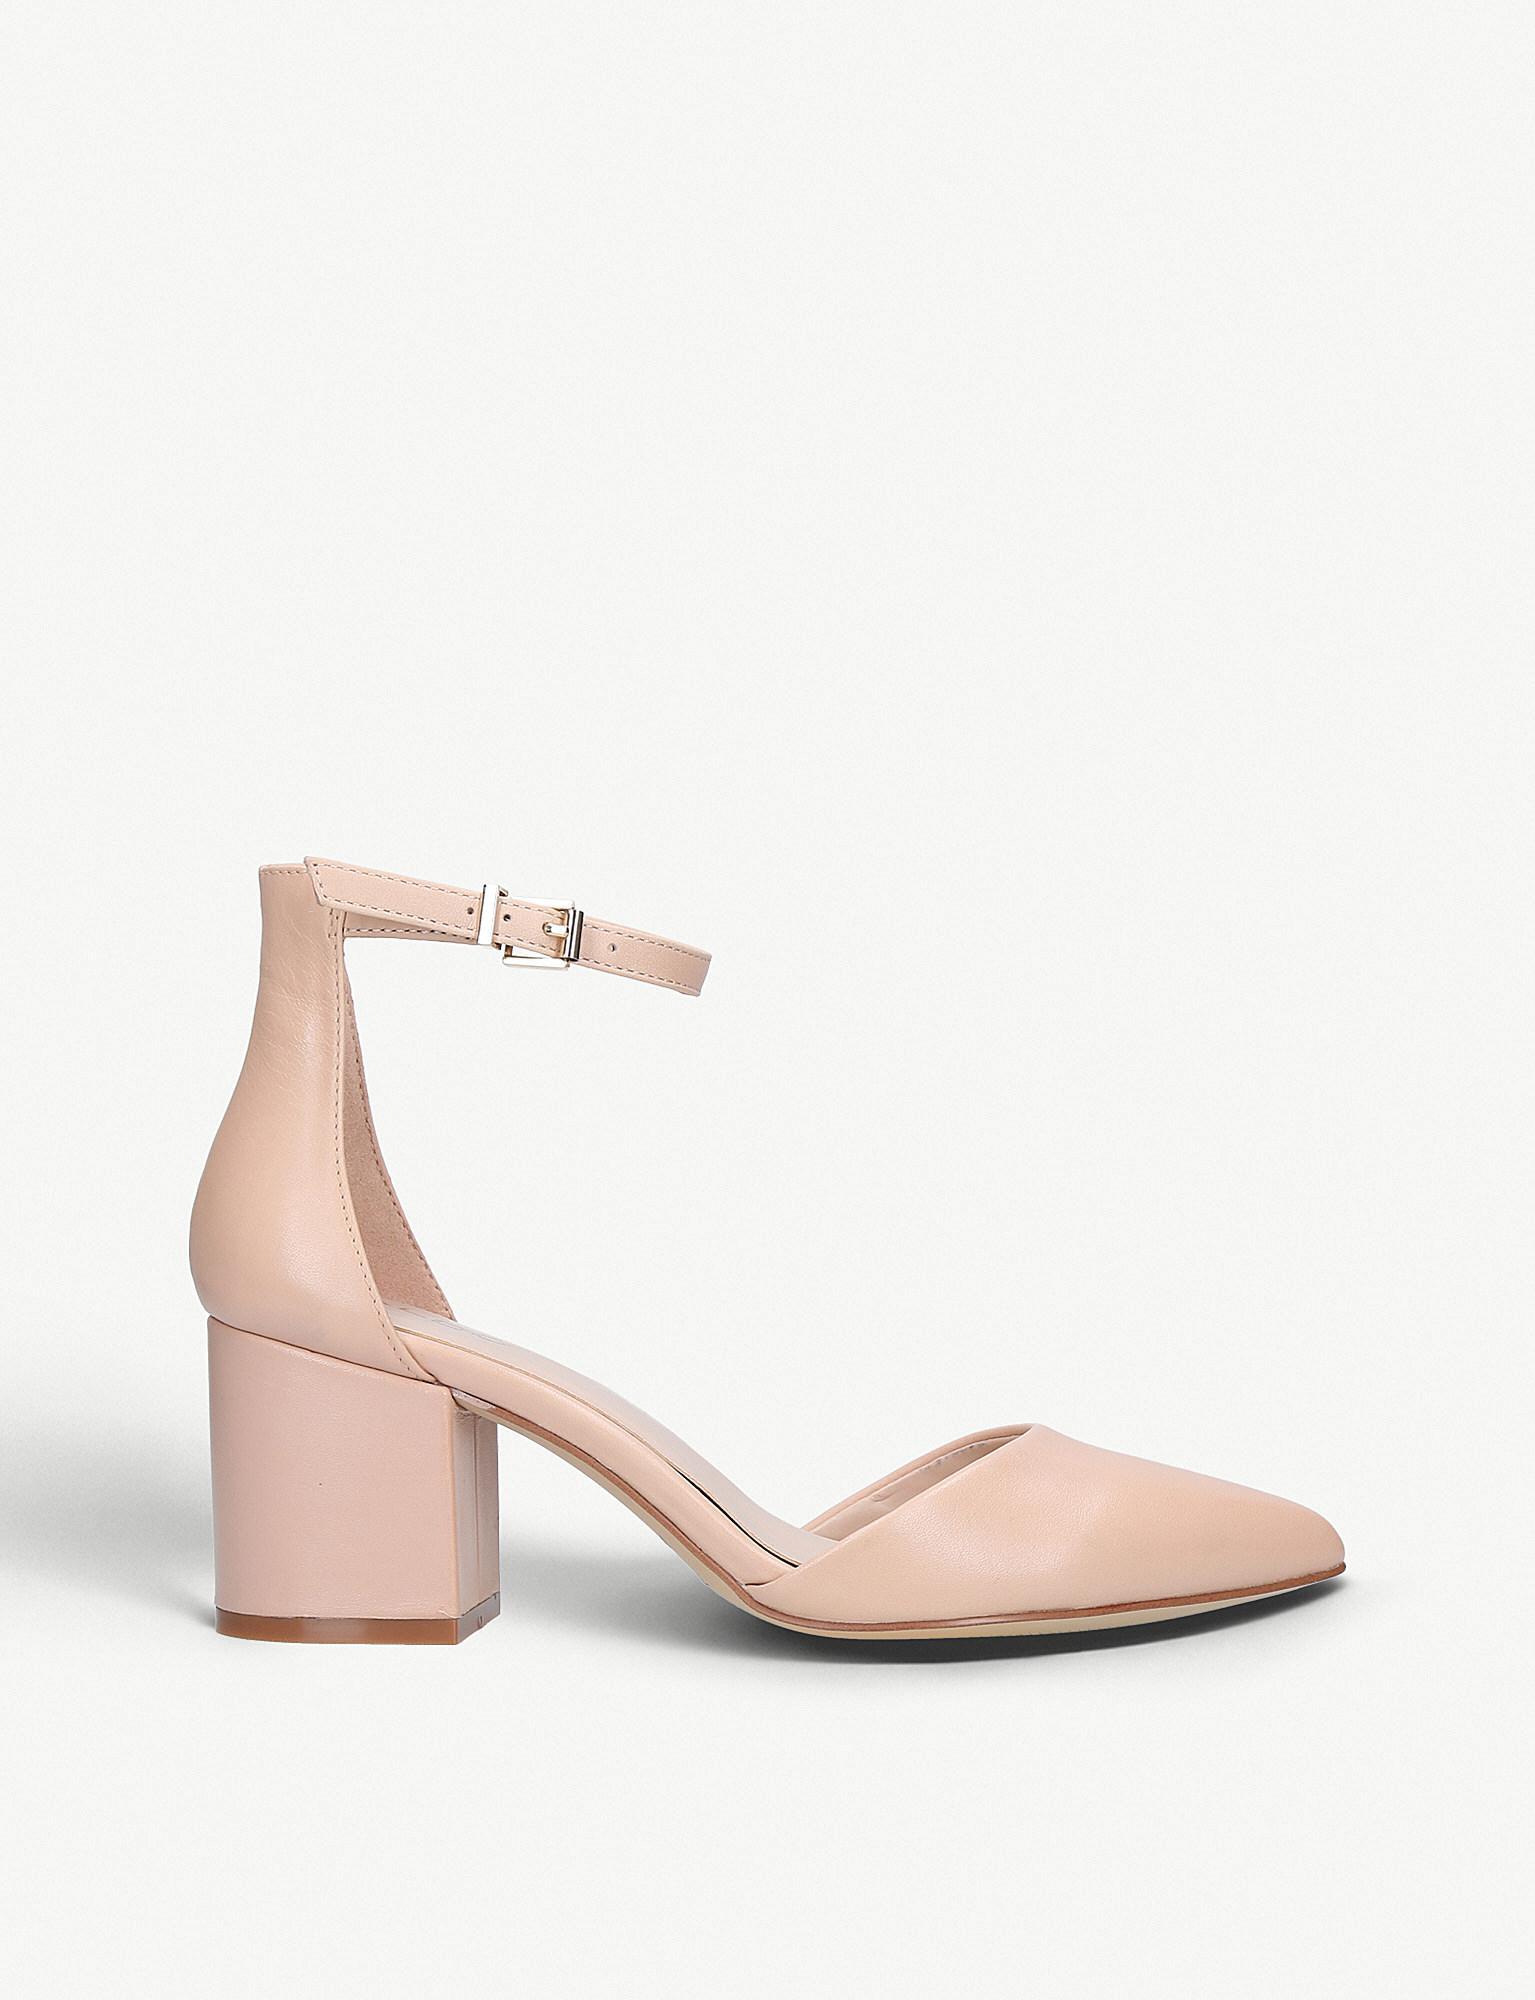 c2e6c1ccf8a ALDO Keclya Leather Sandals in Pink - Lyst